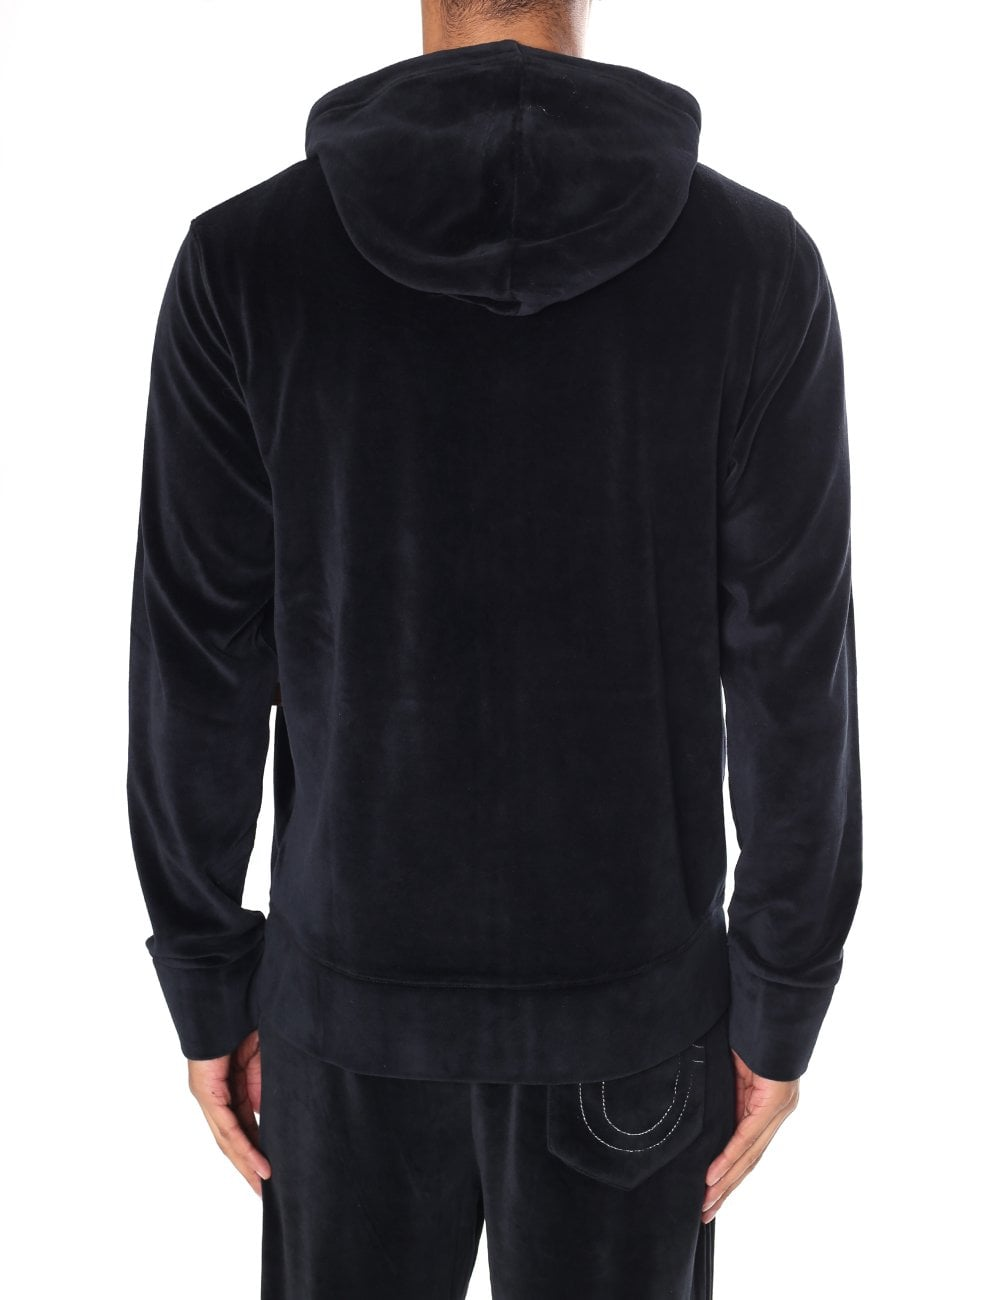 0032e2951 True Religion Men s Velour Zip Up Hoodie Black